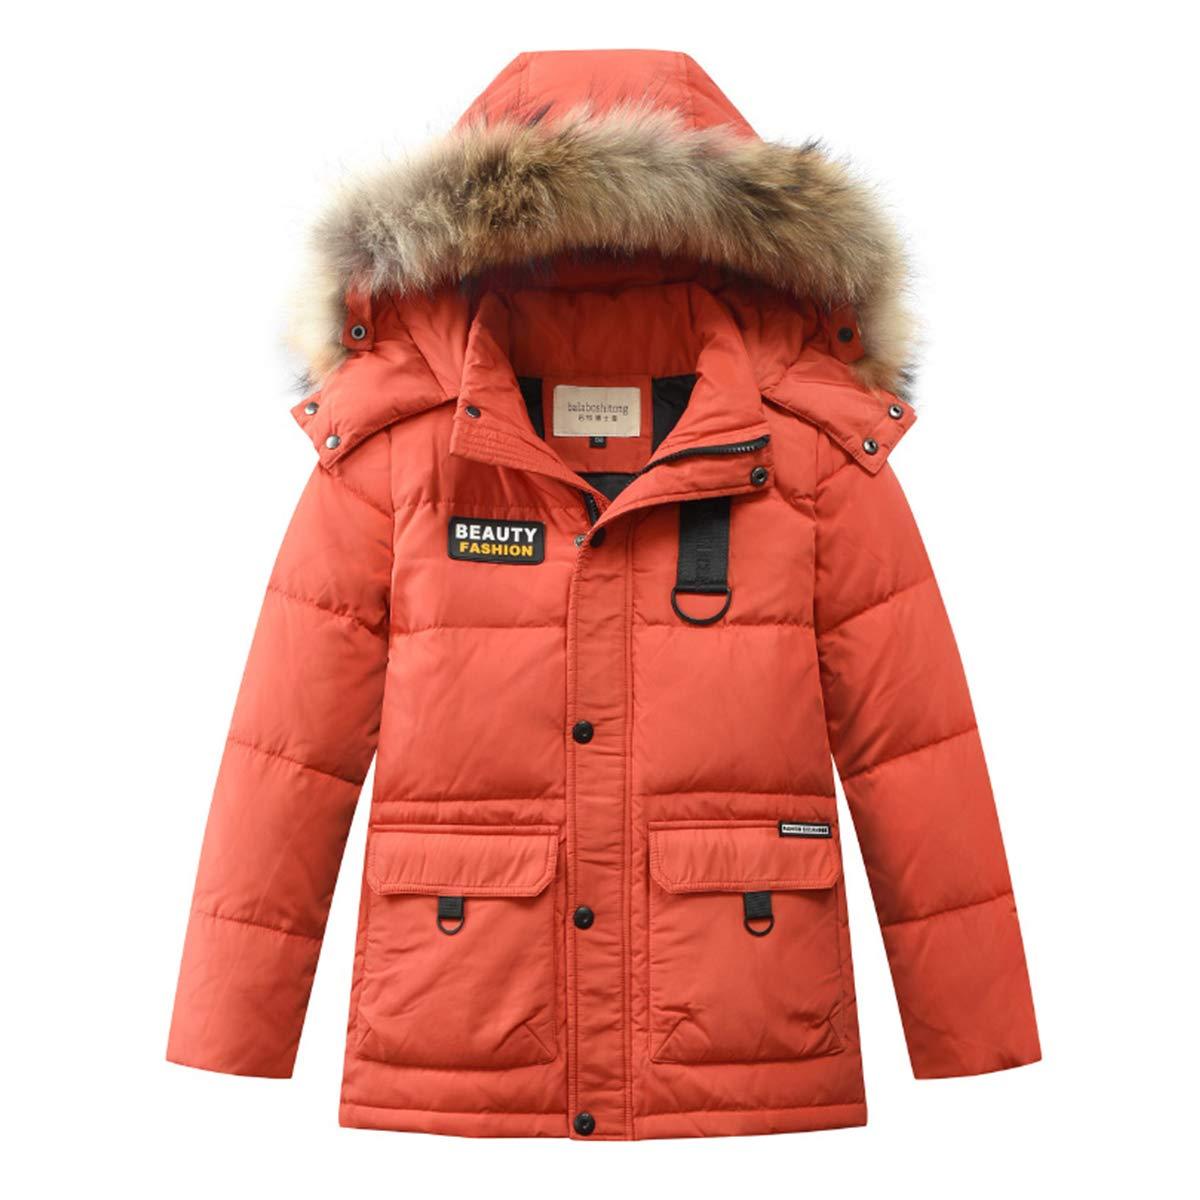 Boys Kids Winter Hooded Down Coat Puffer Jacket for Big Boys Mid-Long (Orange, 4)